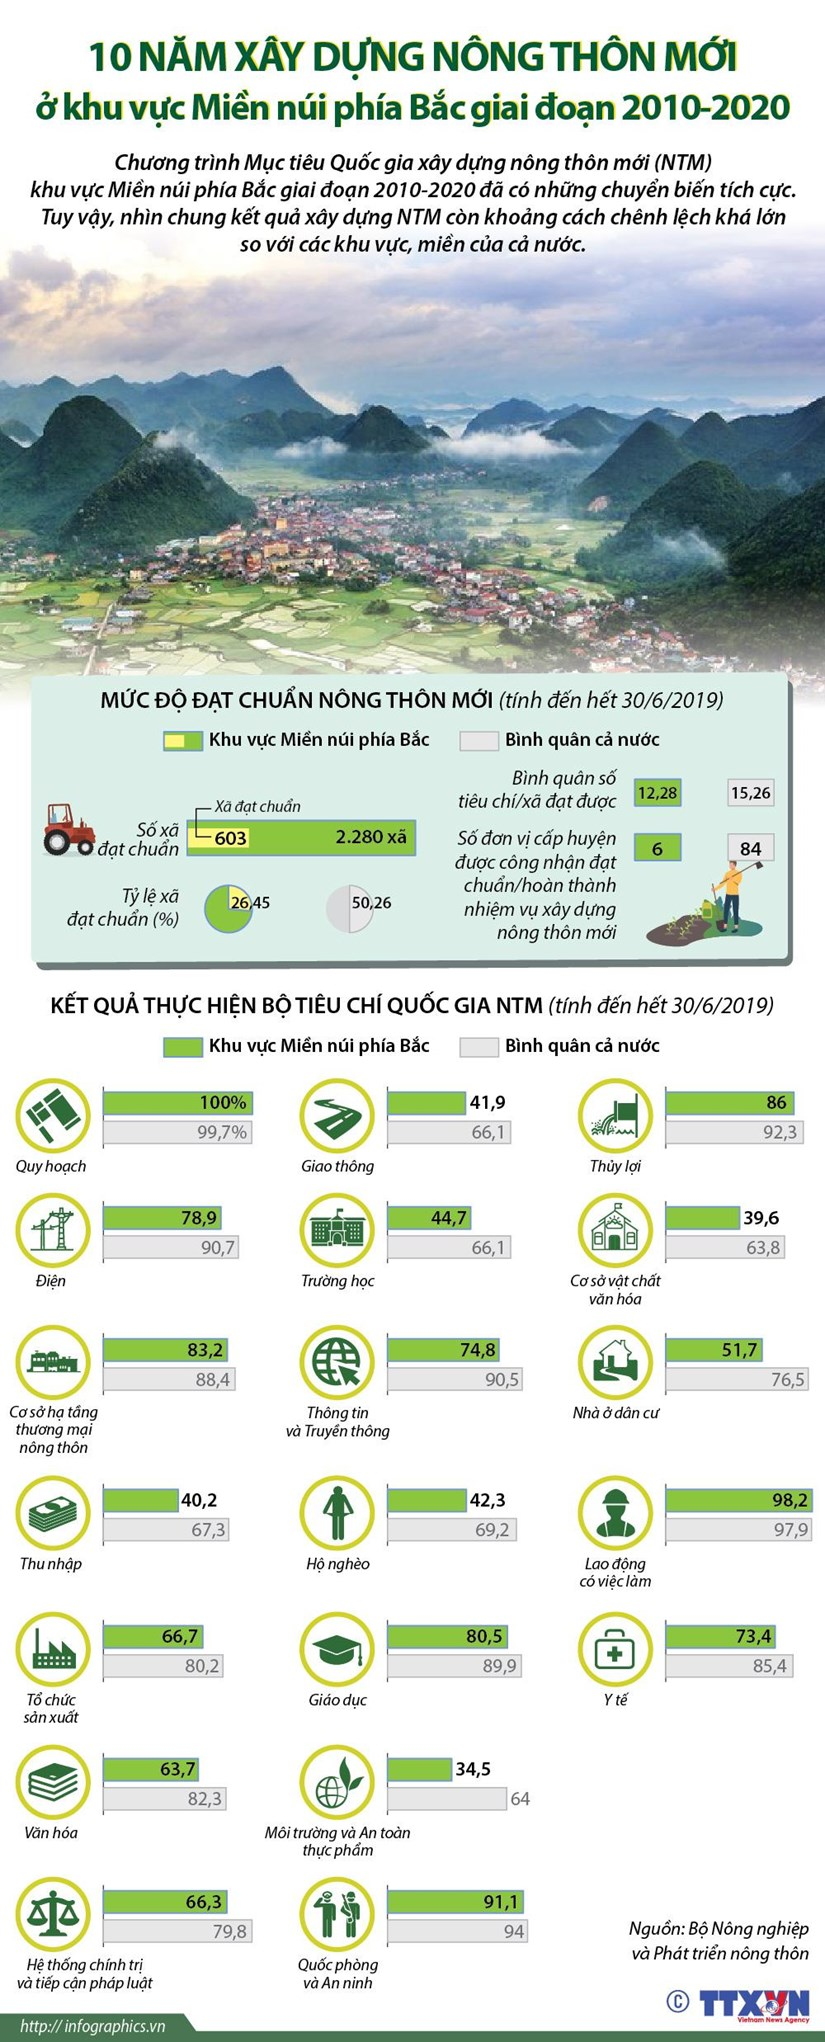 [Infographics] 10 nam xay dung nong thon moi o vung mien nui phia Bac hinh anh 1